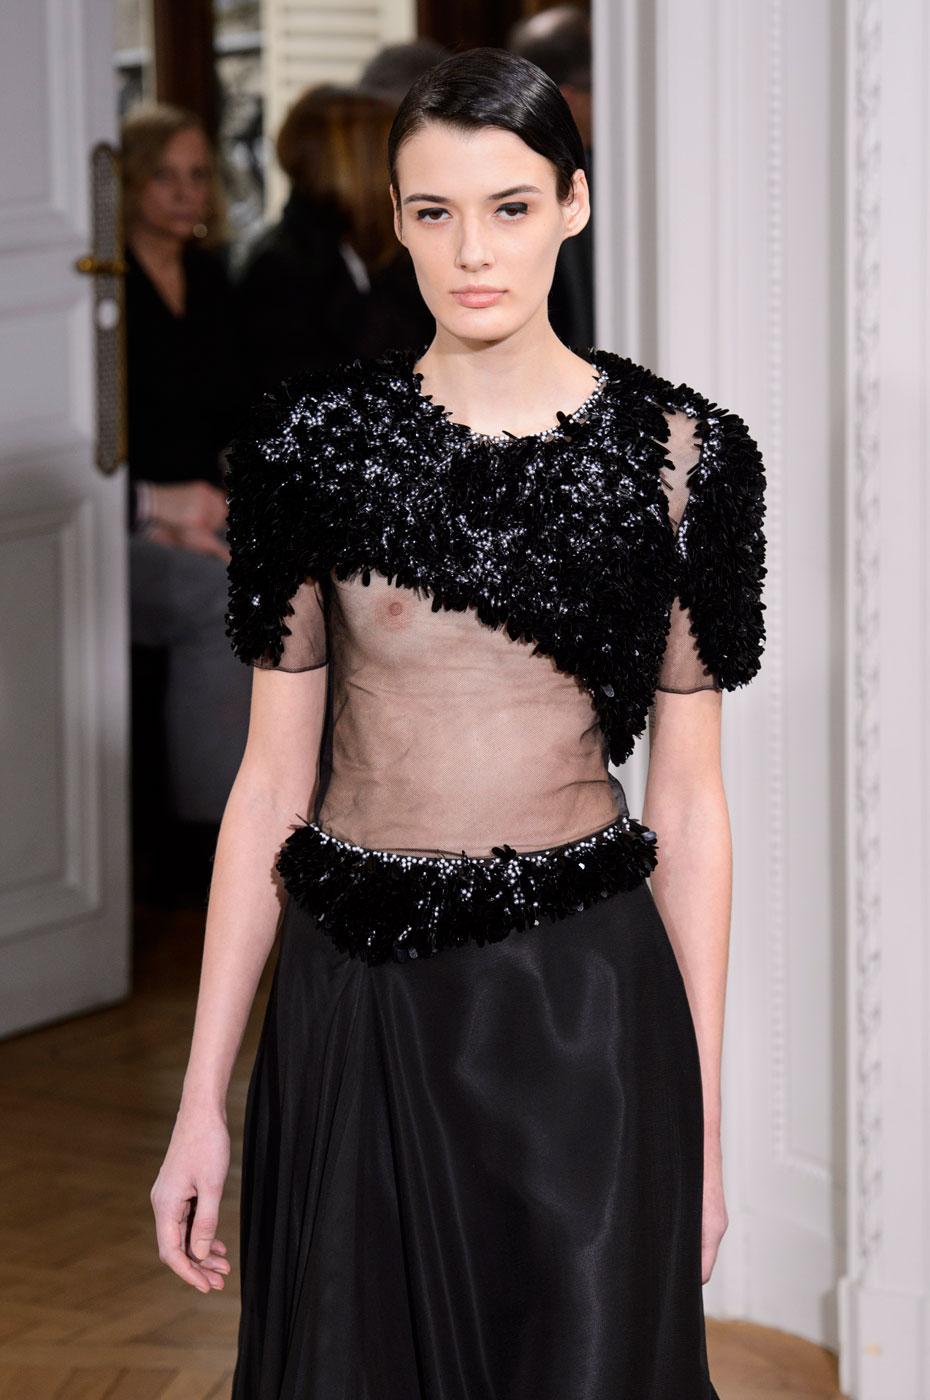 Bouchra-Jarrar-fashion-runway-show-haute-couture-paris-spring-summer-2015-the-impression-40